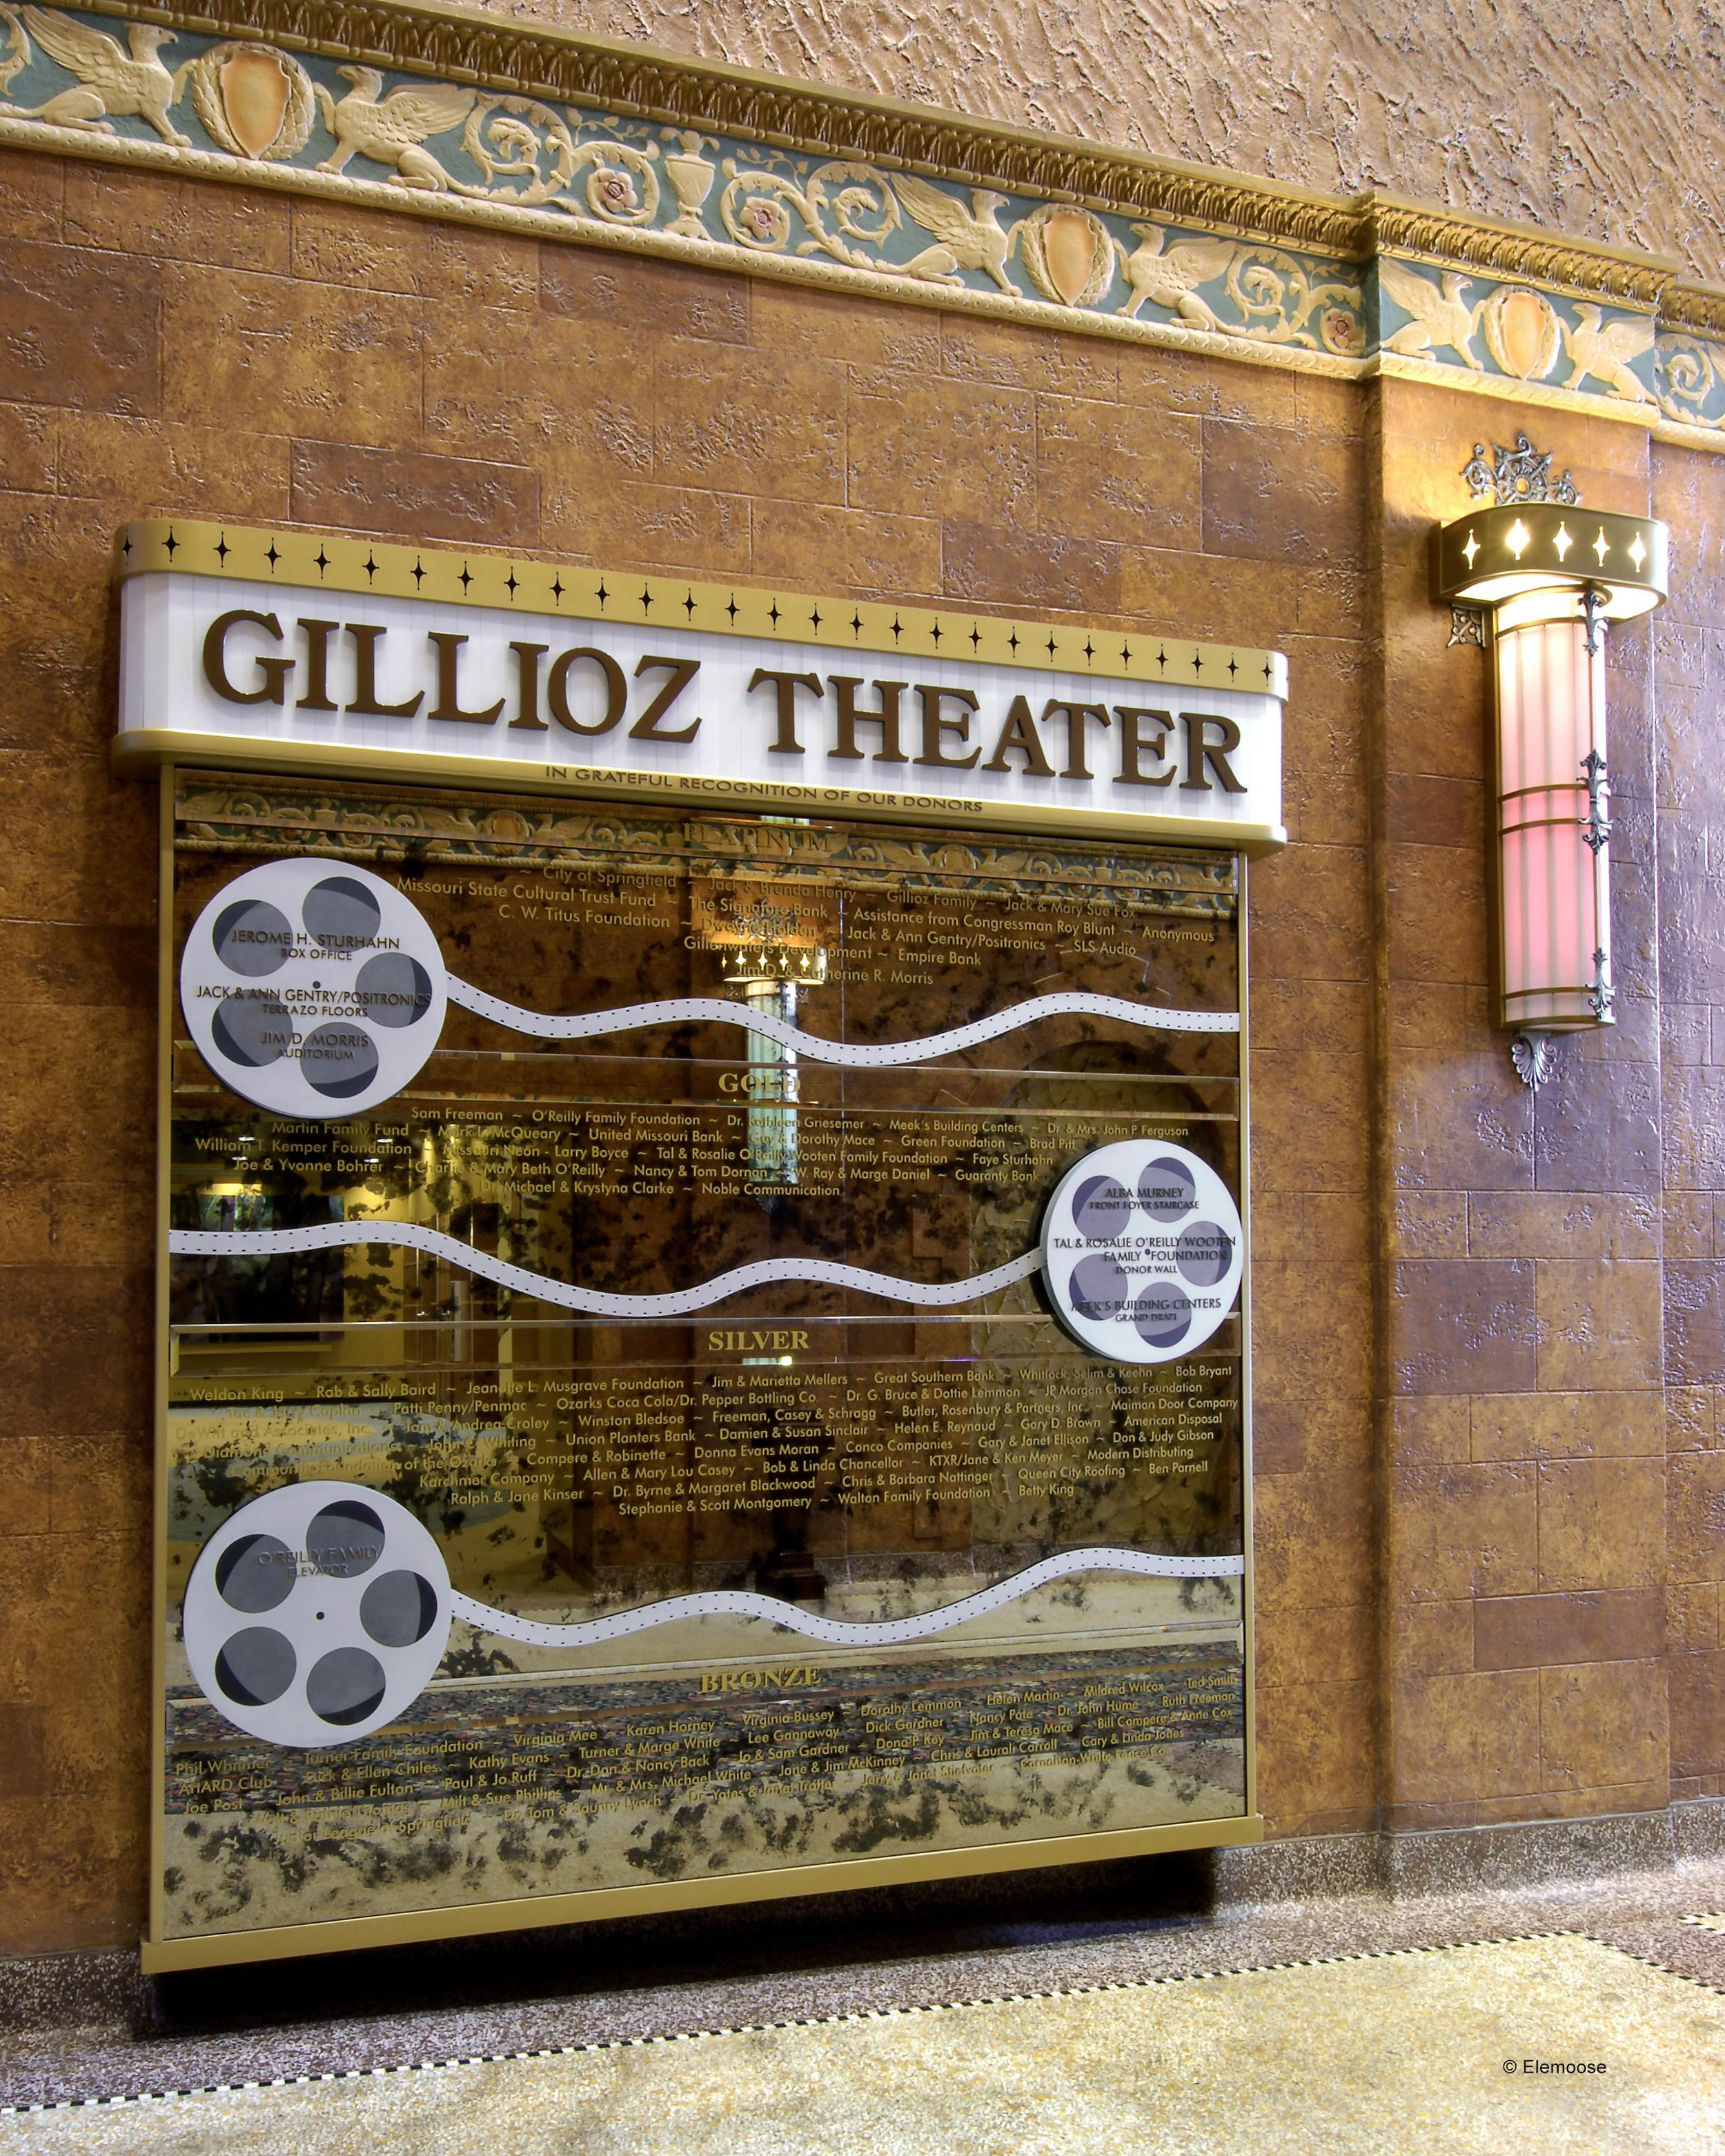 gillioz-donorwall-3d-elements-reflective-vinyl-springfield-mo.jpg